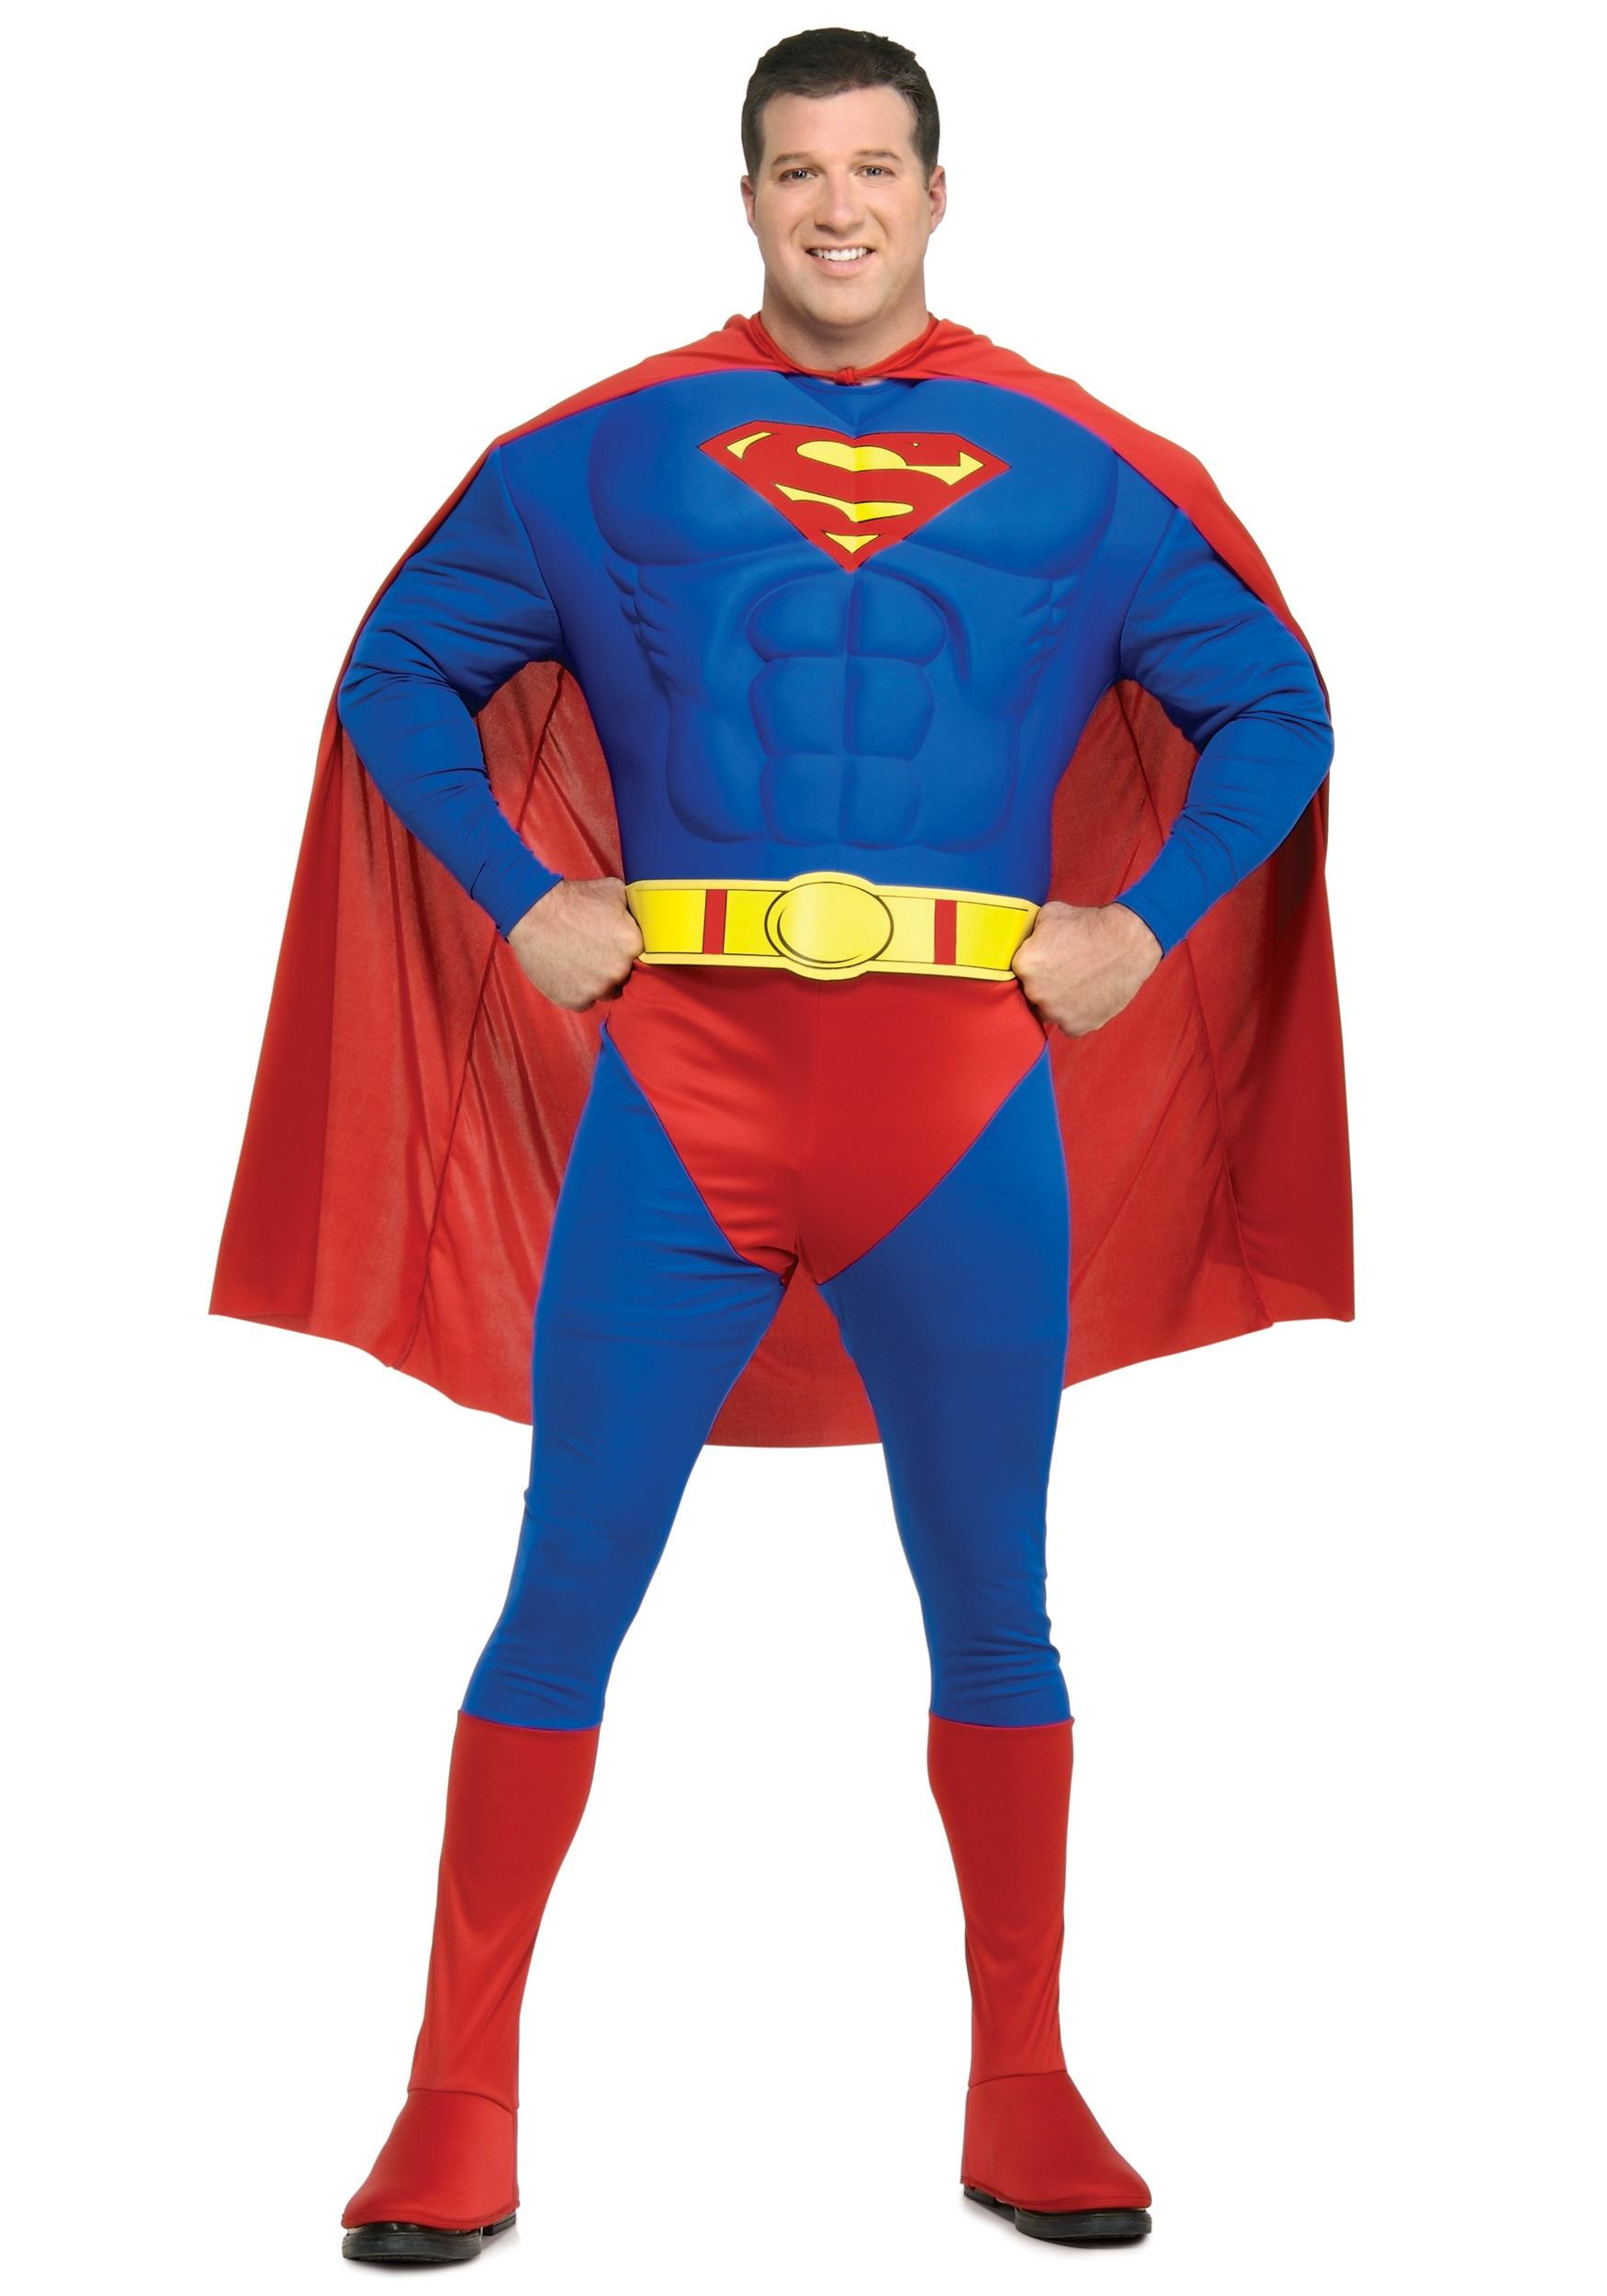 Plus Size Superman Superhero Costume